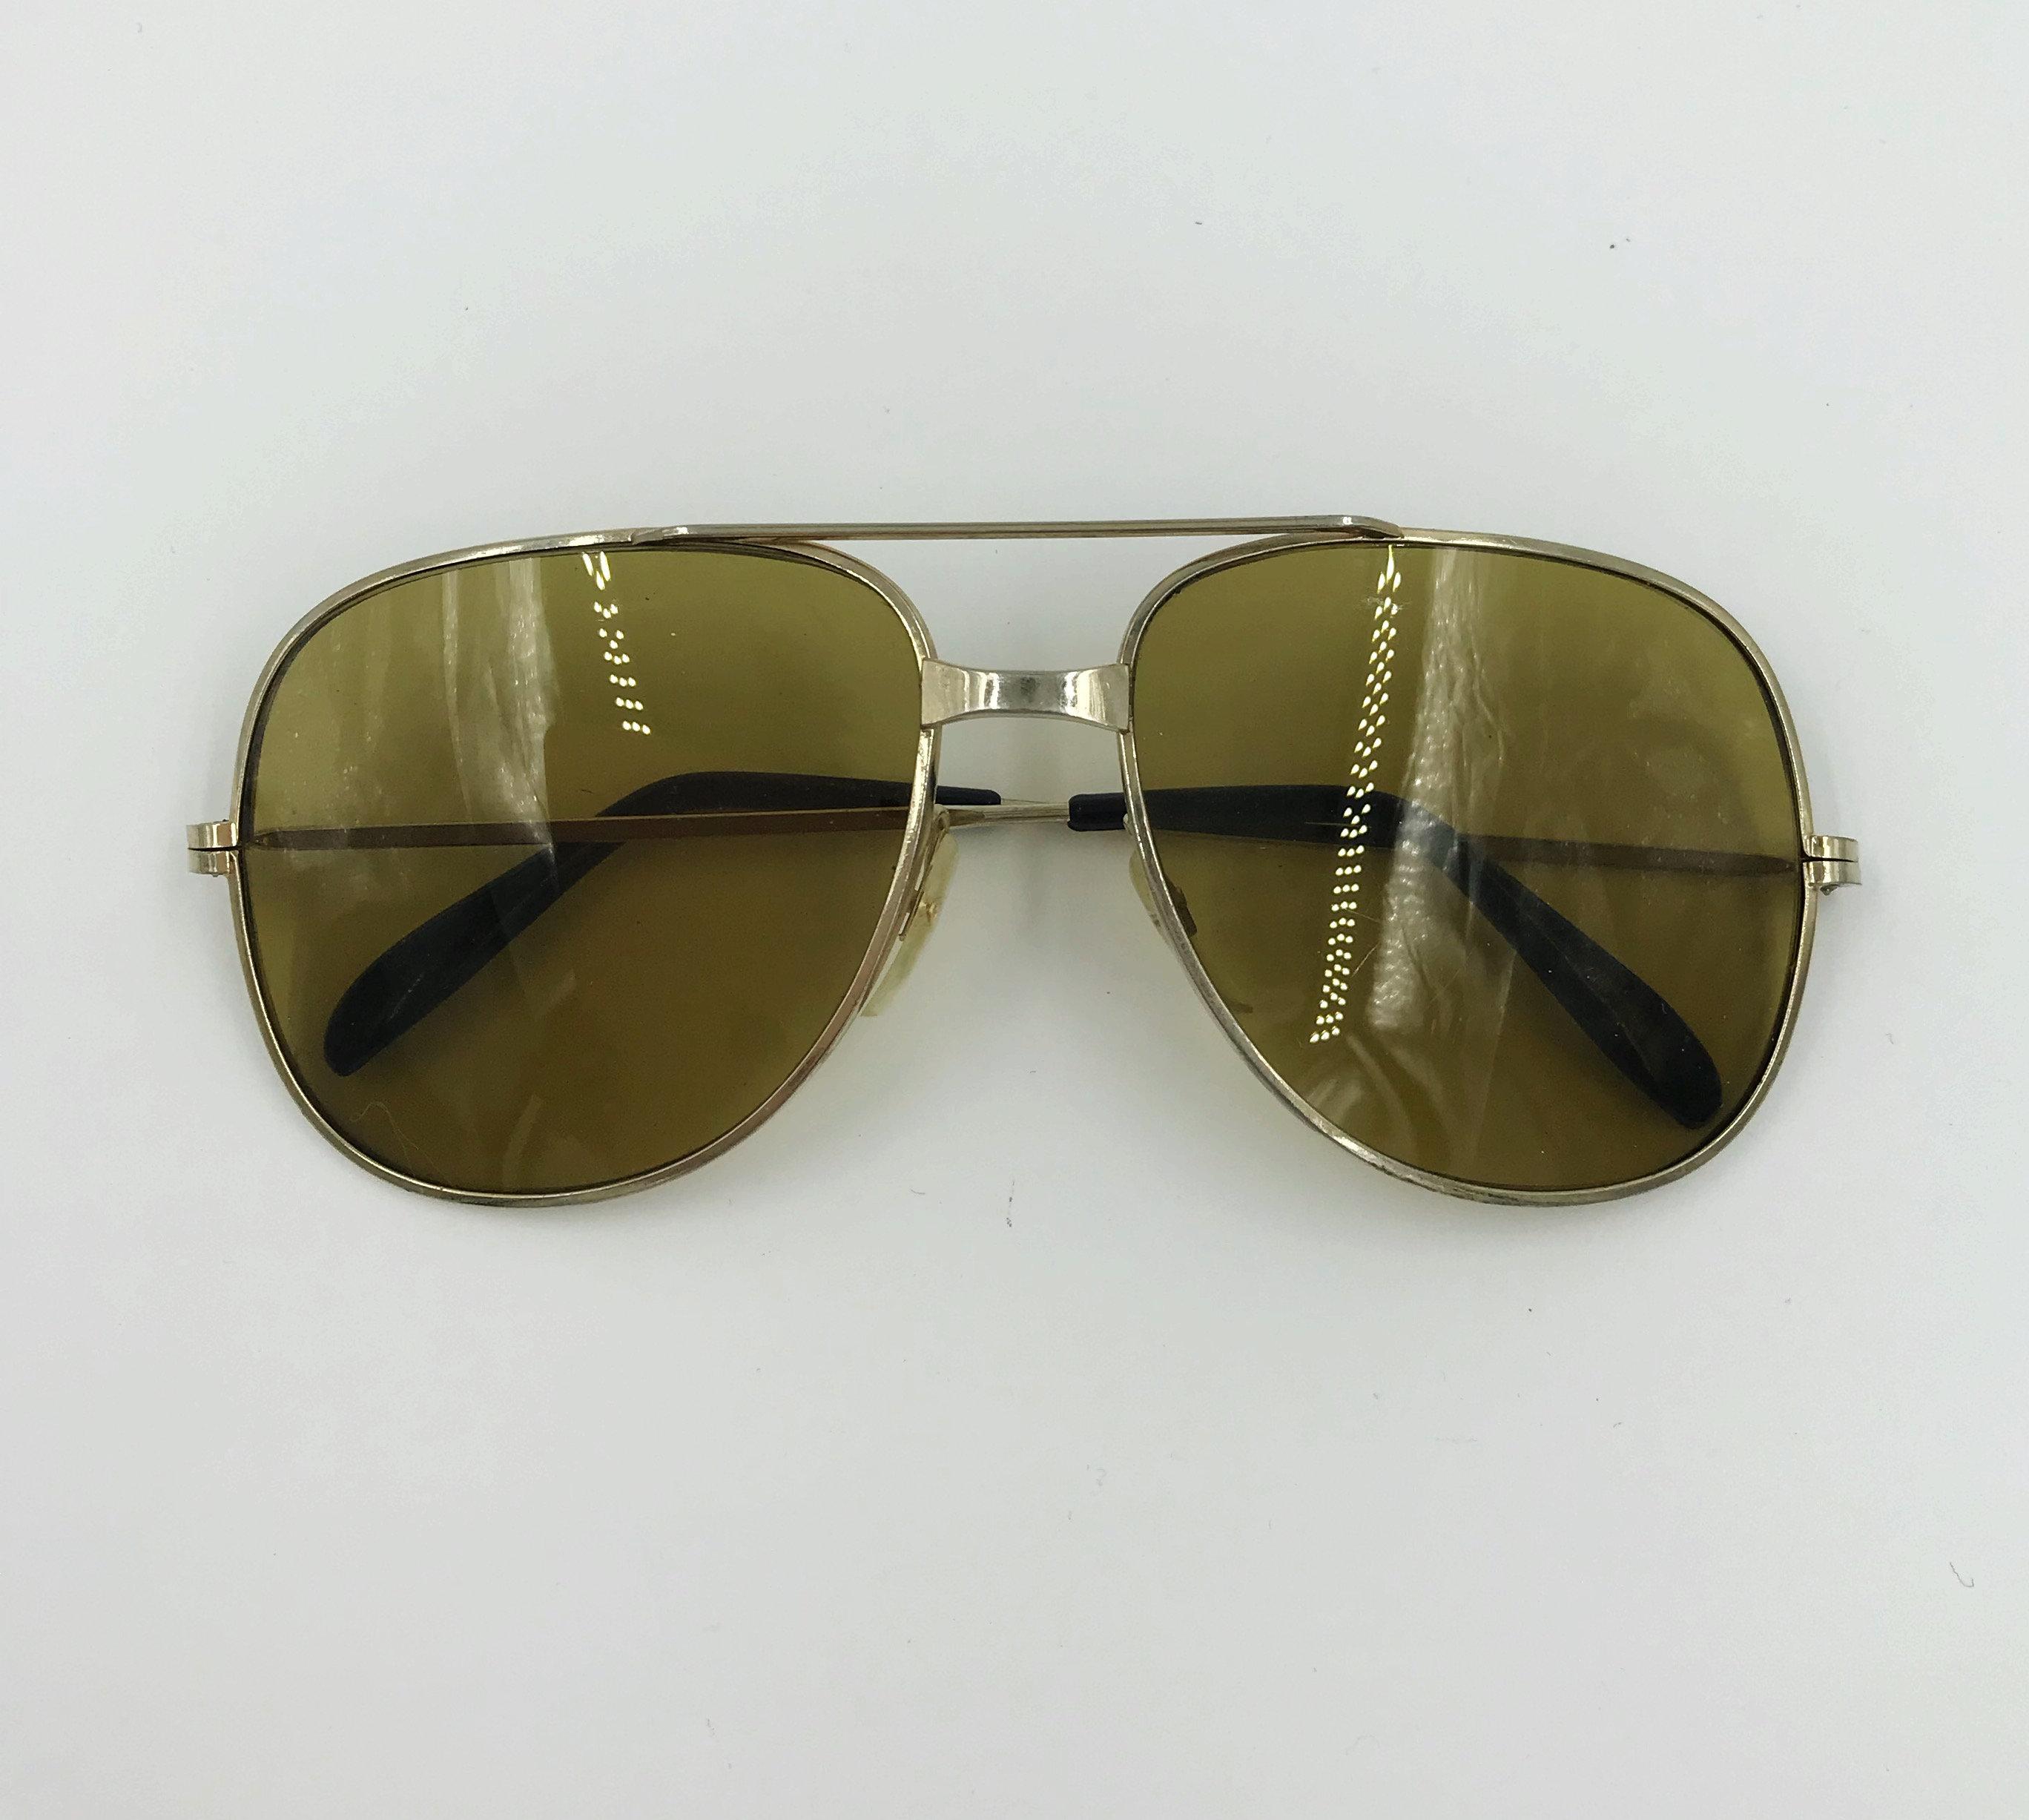 c40c46020b3 70 s Sunglasses Vintage Aviator Mens Retro Seventies Hippie Shades - VTG  Gold Tone Sunglasses Large Brown Tinted Sunnies Eyewear. gallery photo .